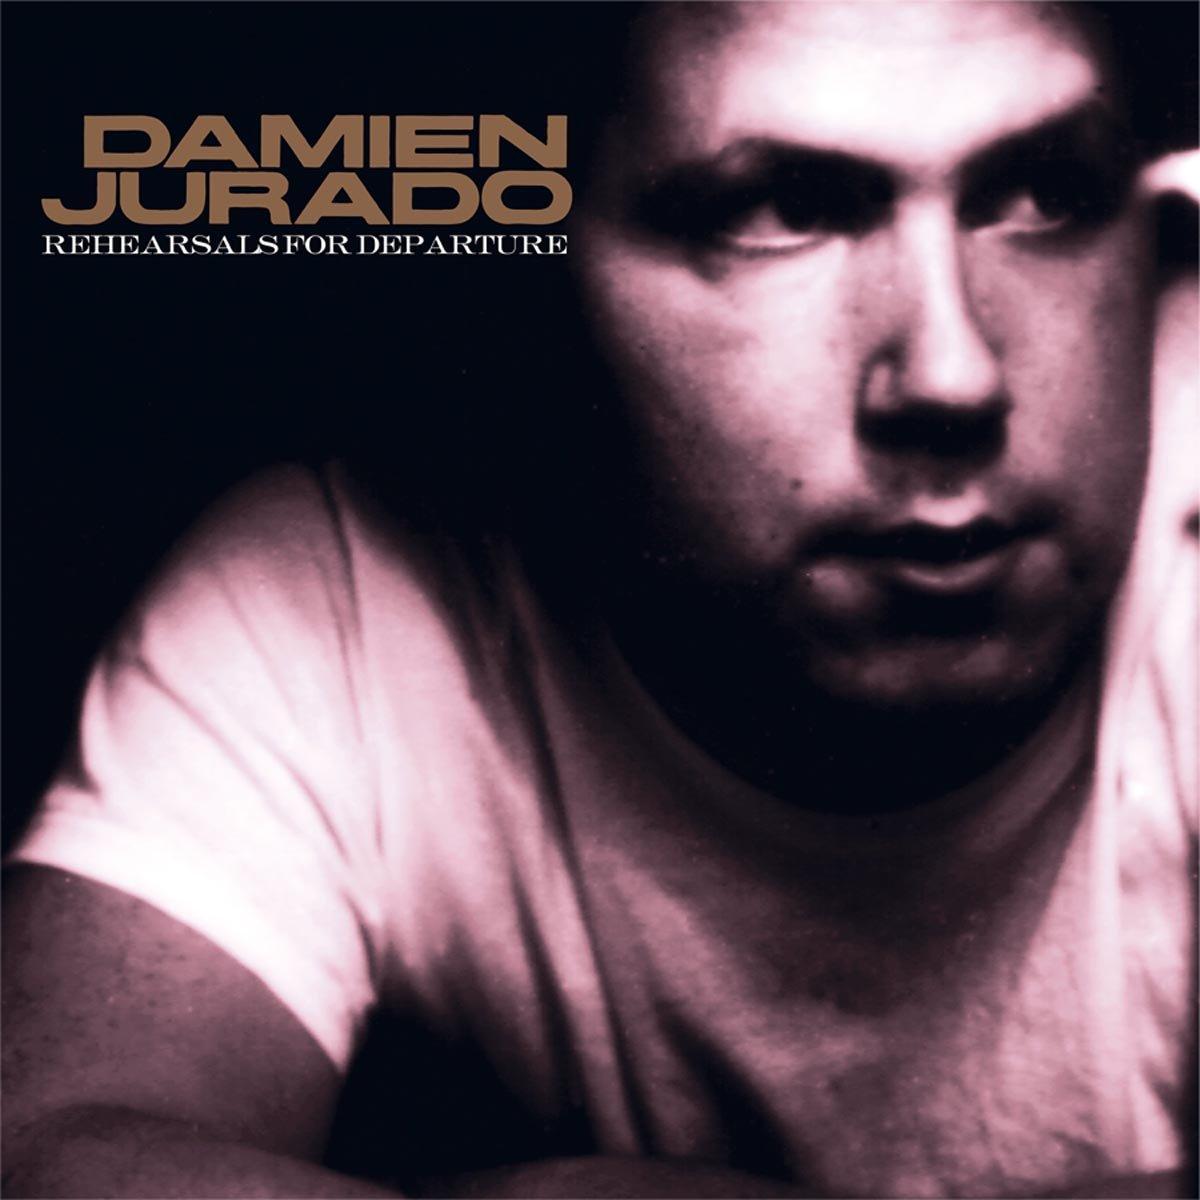 Cassette : Damien Jurado - Rehearsals For Departure (Cassette)